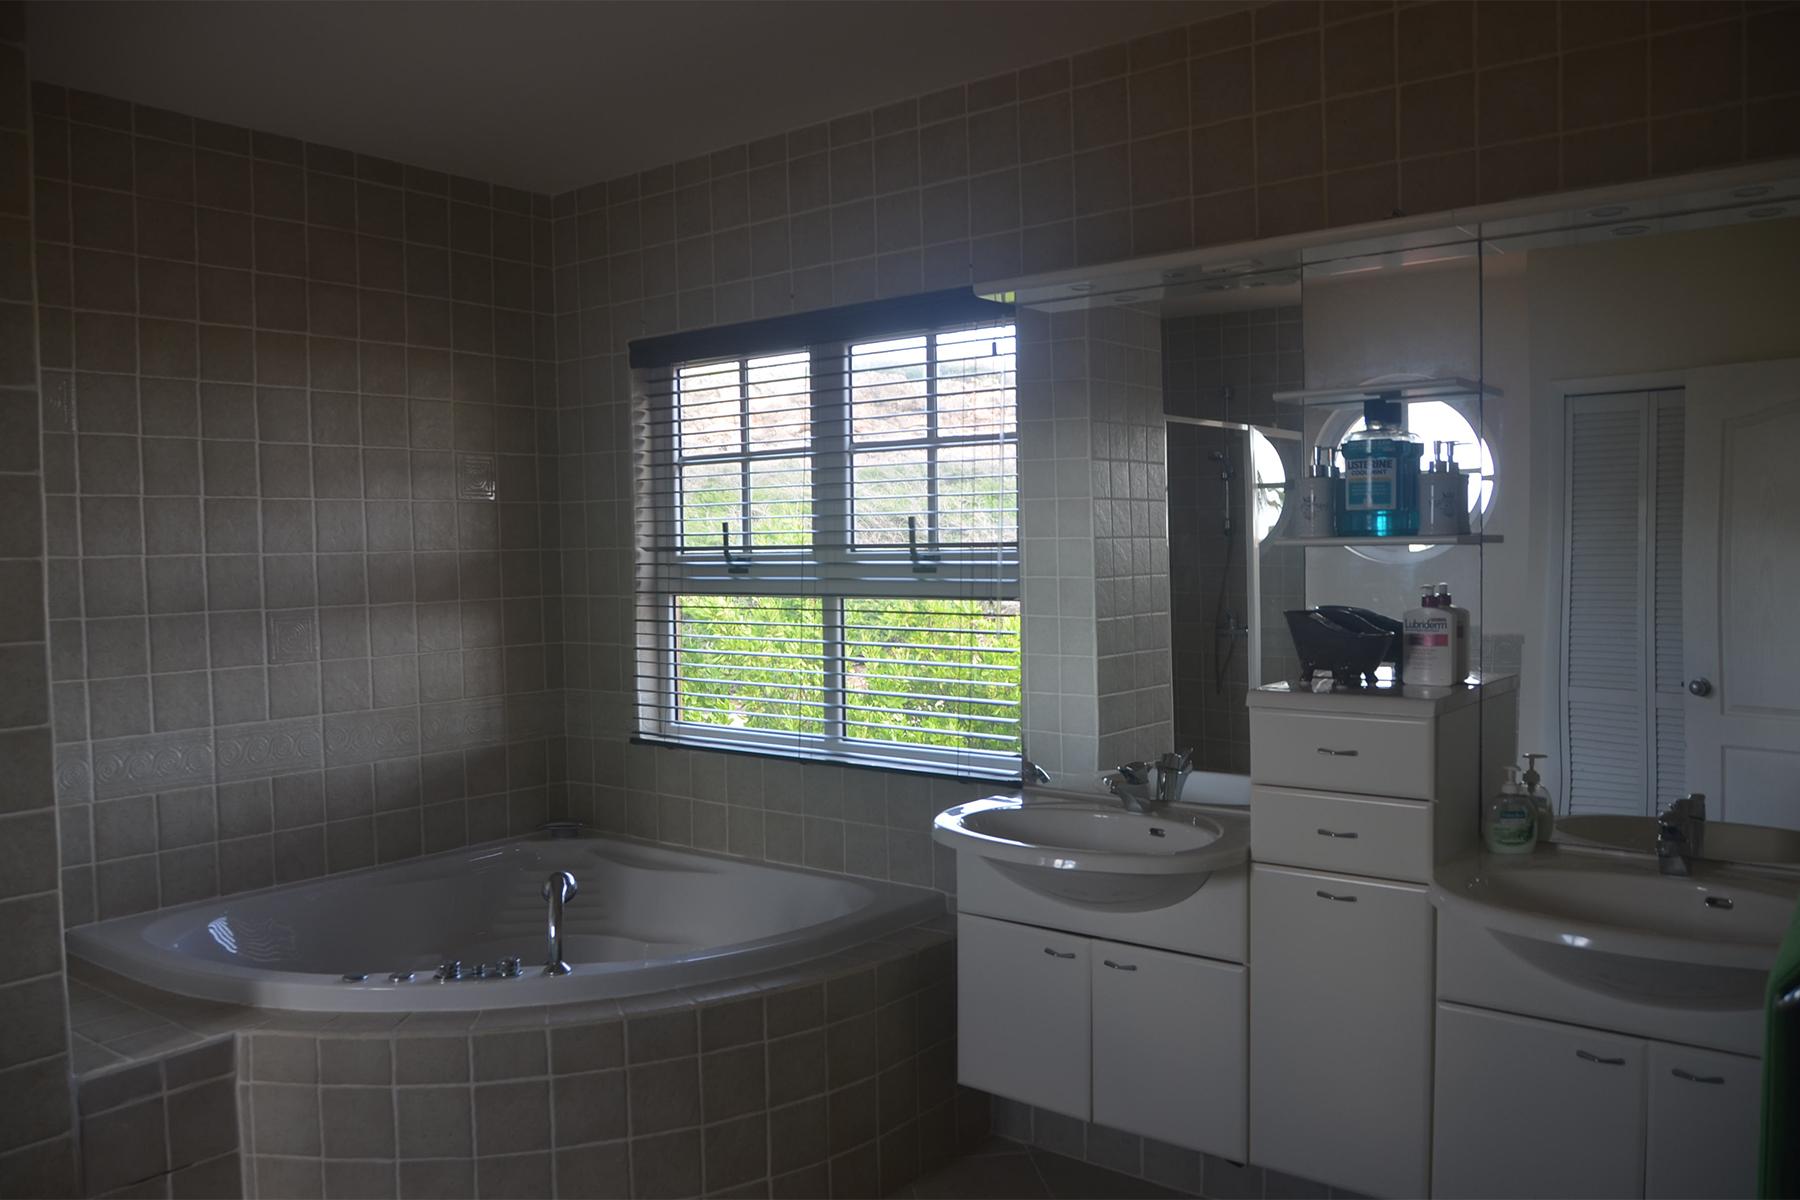 Additional photo for property listing at Mesa Vista 11 阿鲁巴其他地方, 阿鲁巴岛上的城市 阿鲁巴岛